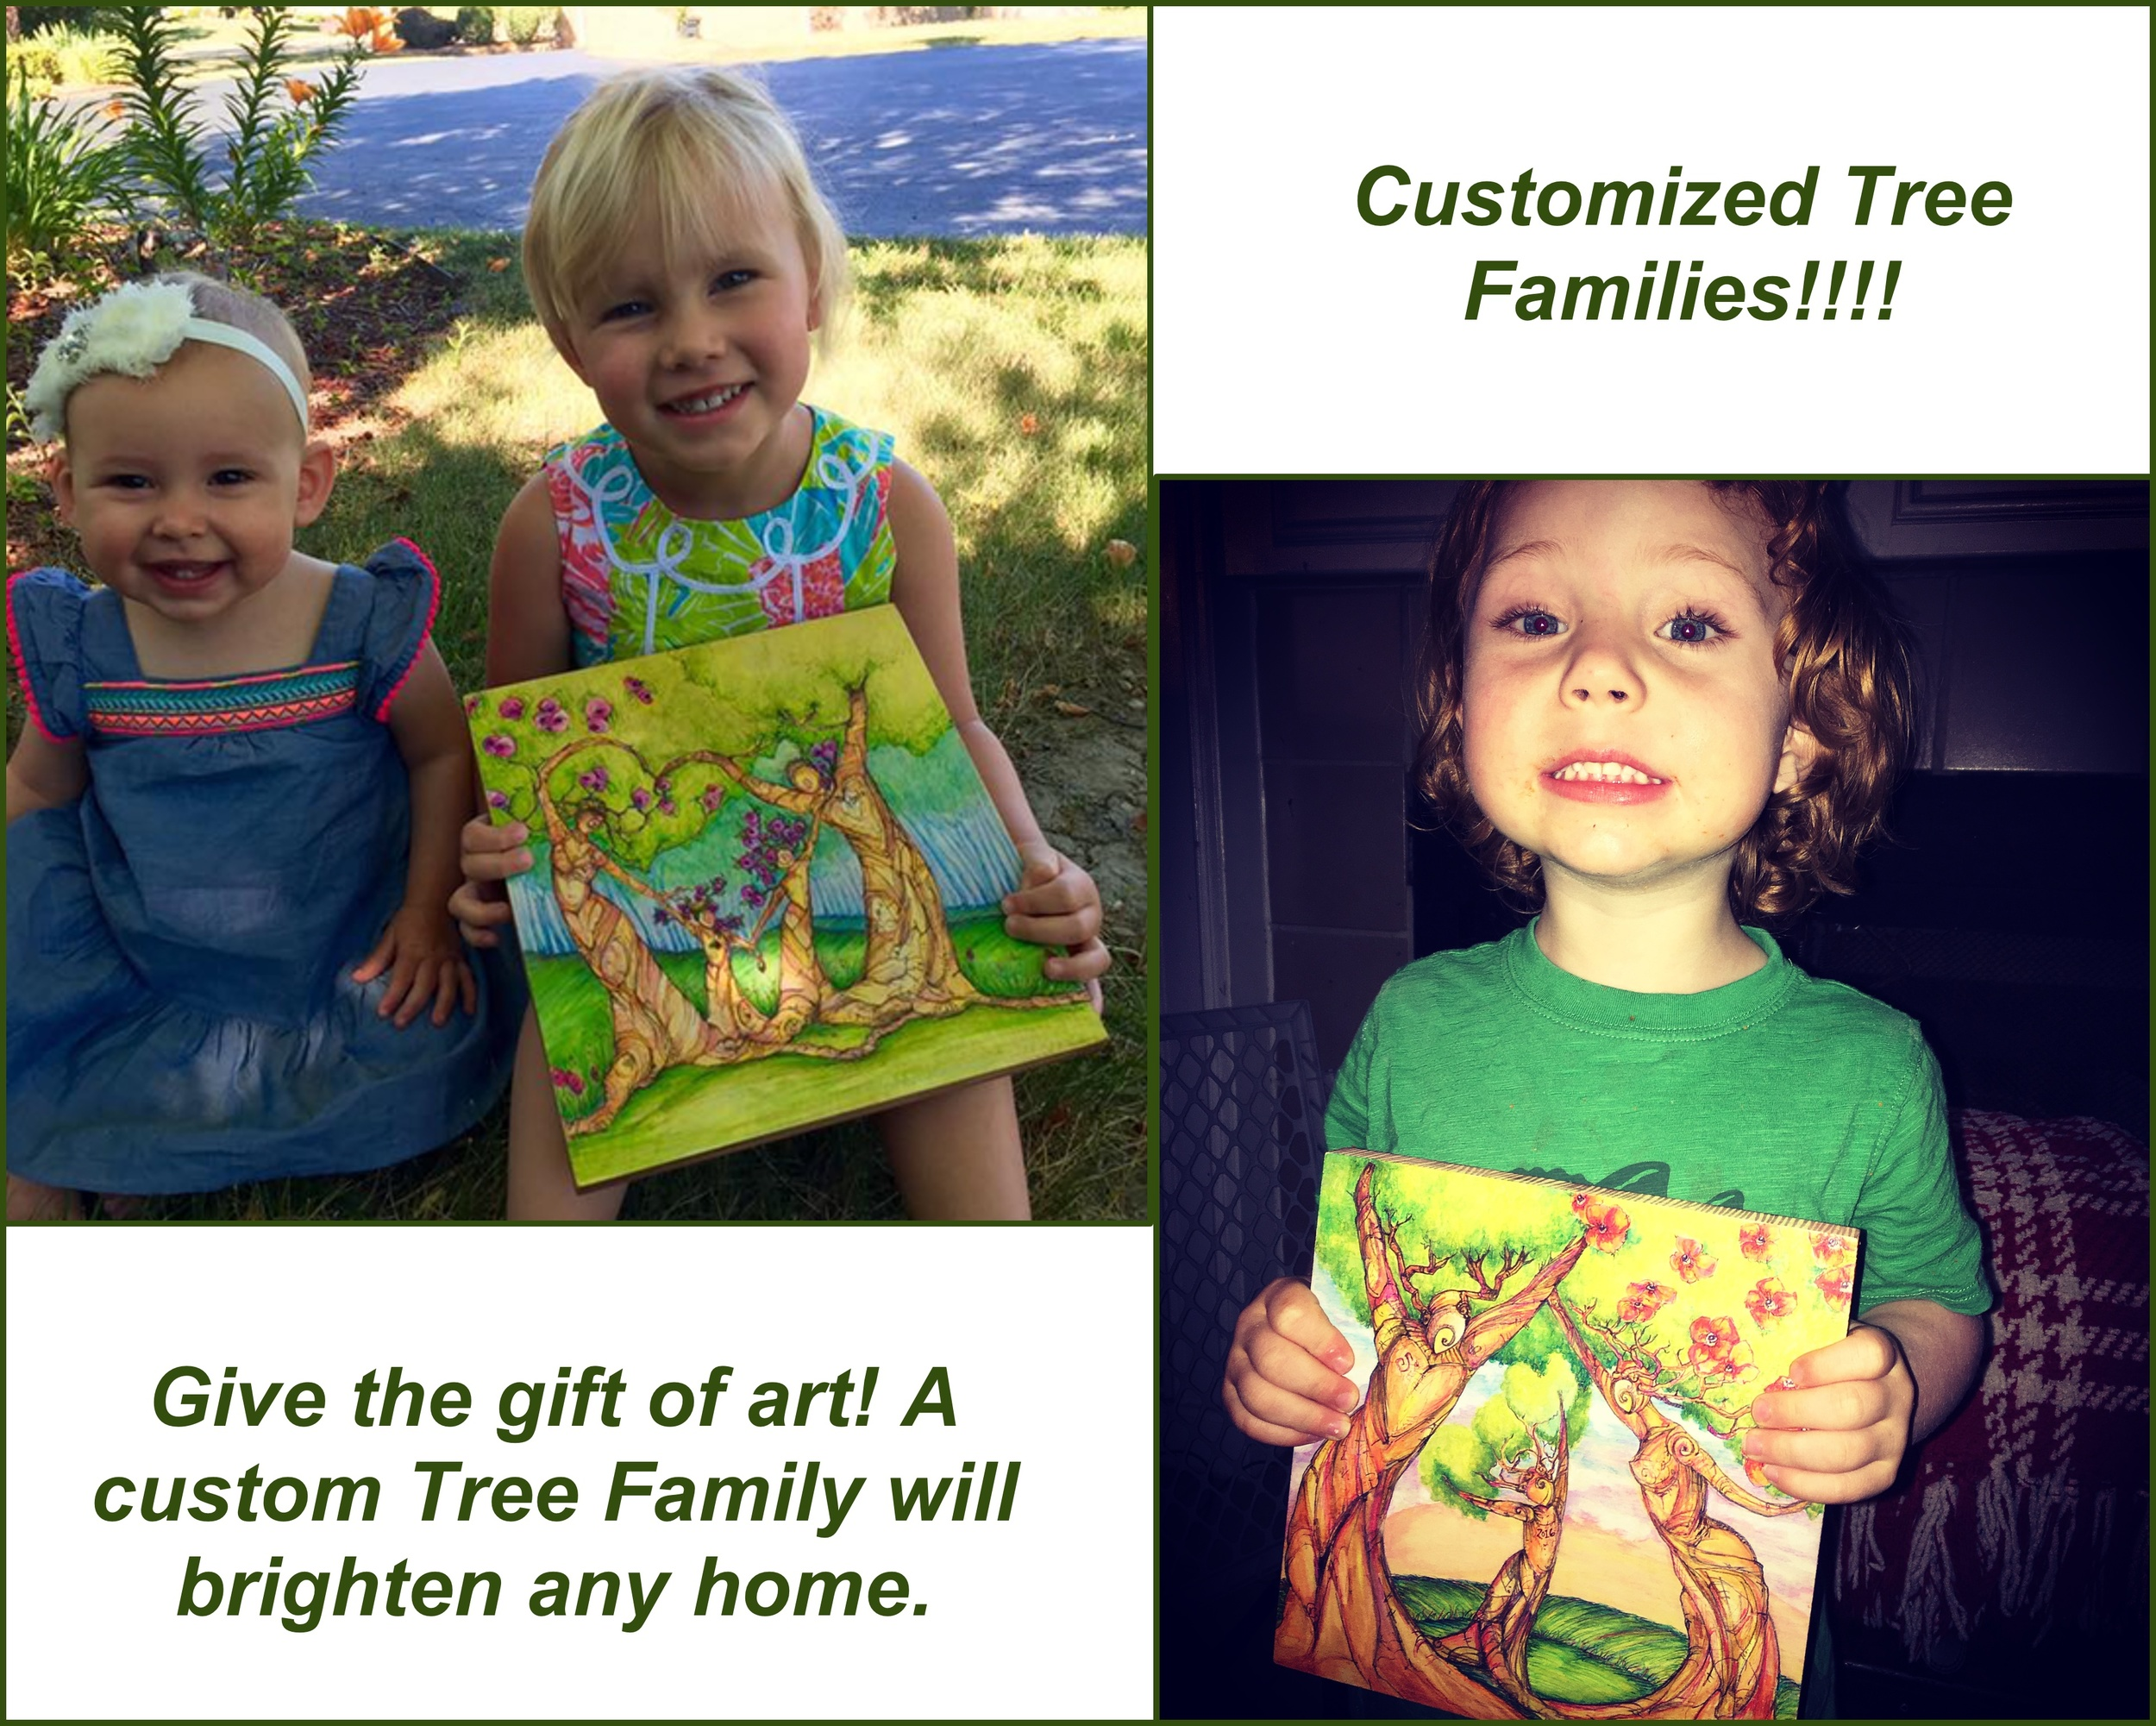 Customized Tree Family Kids.jpg